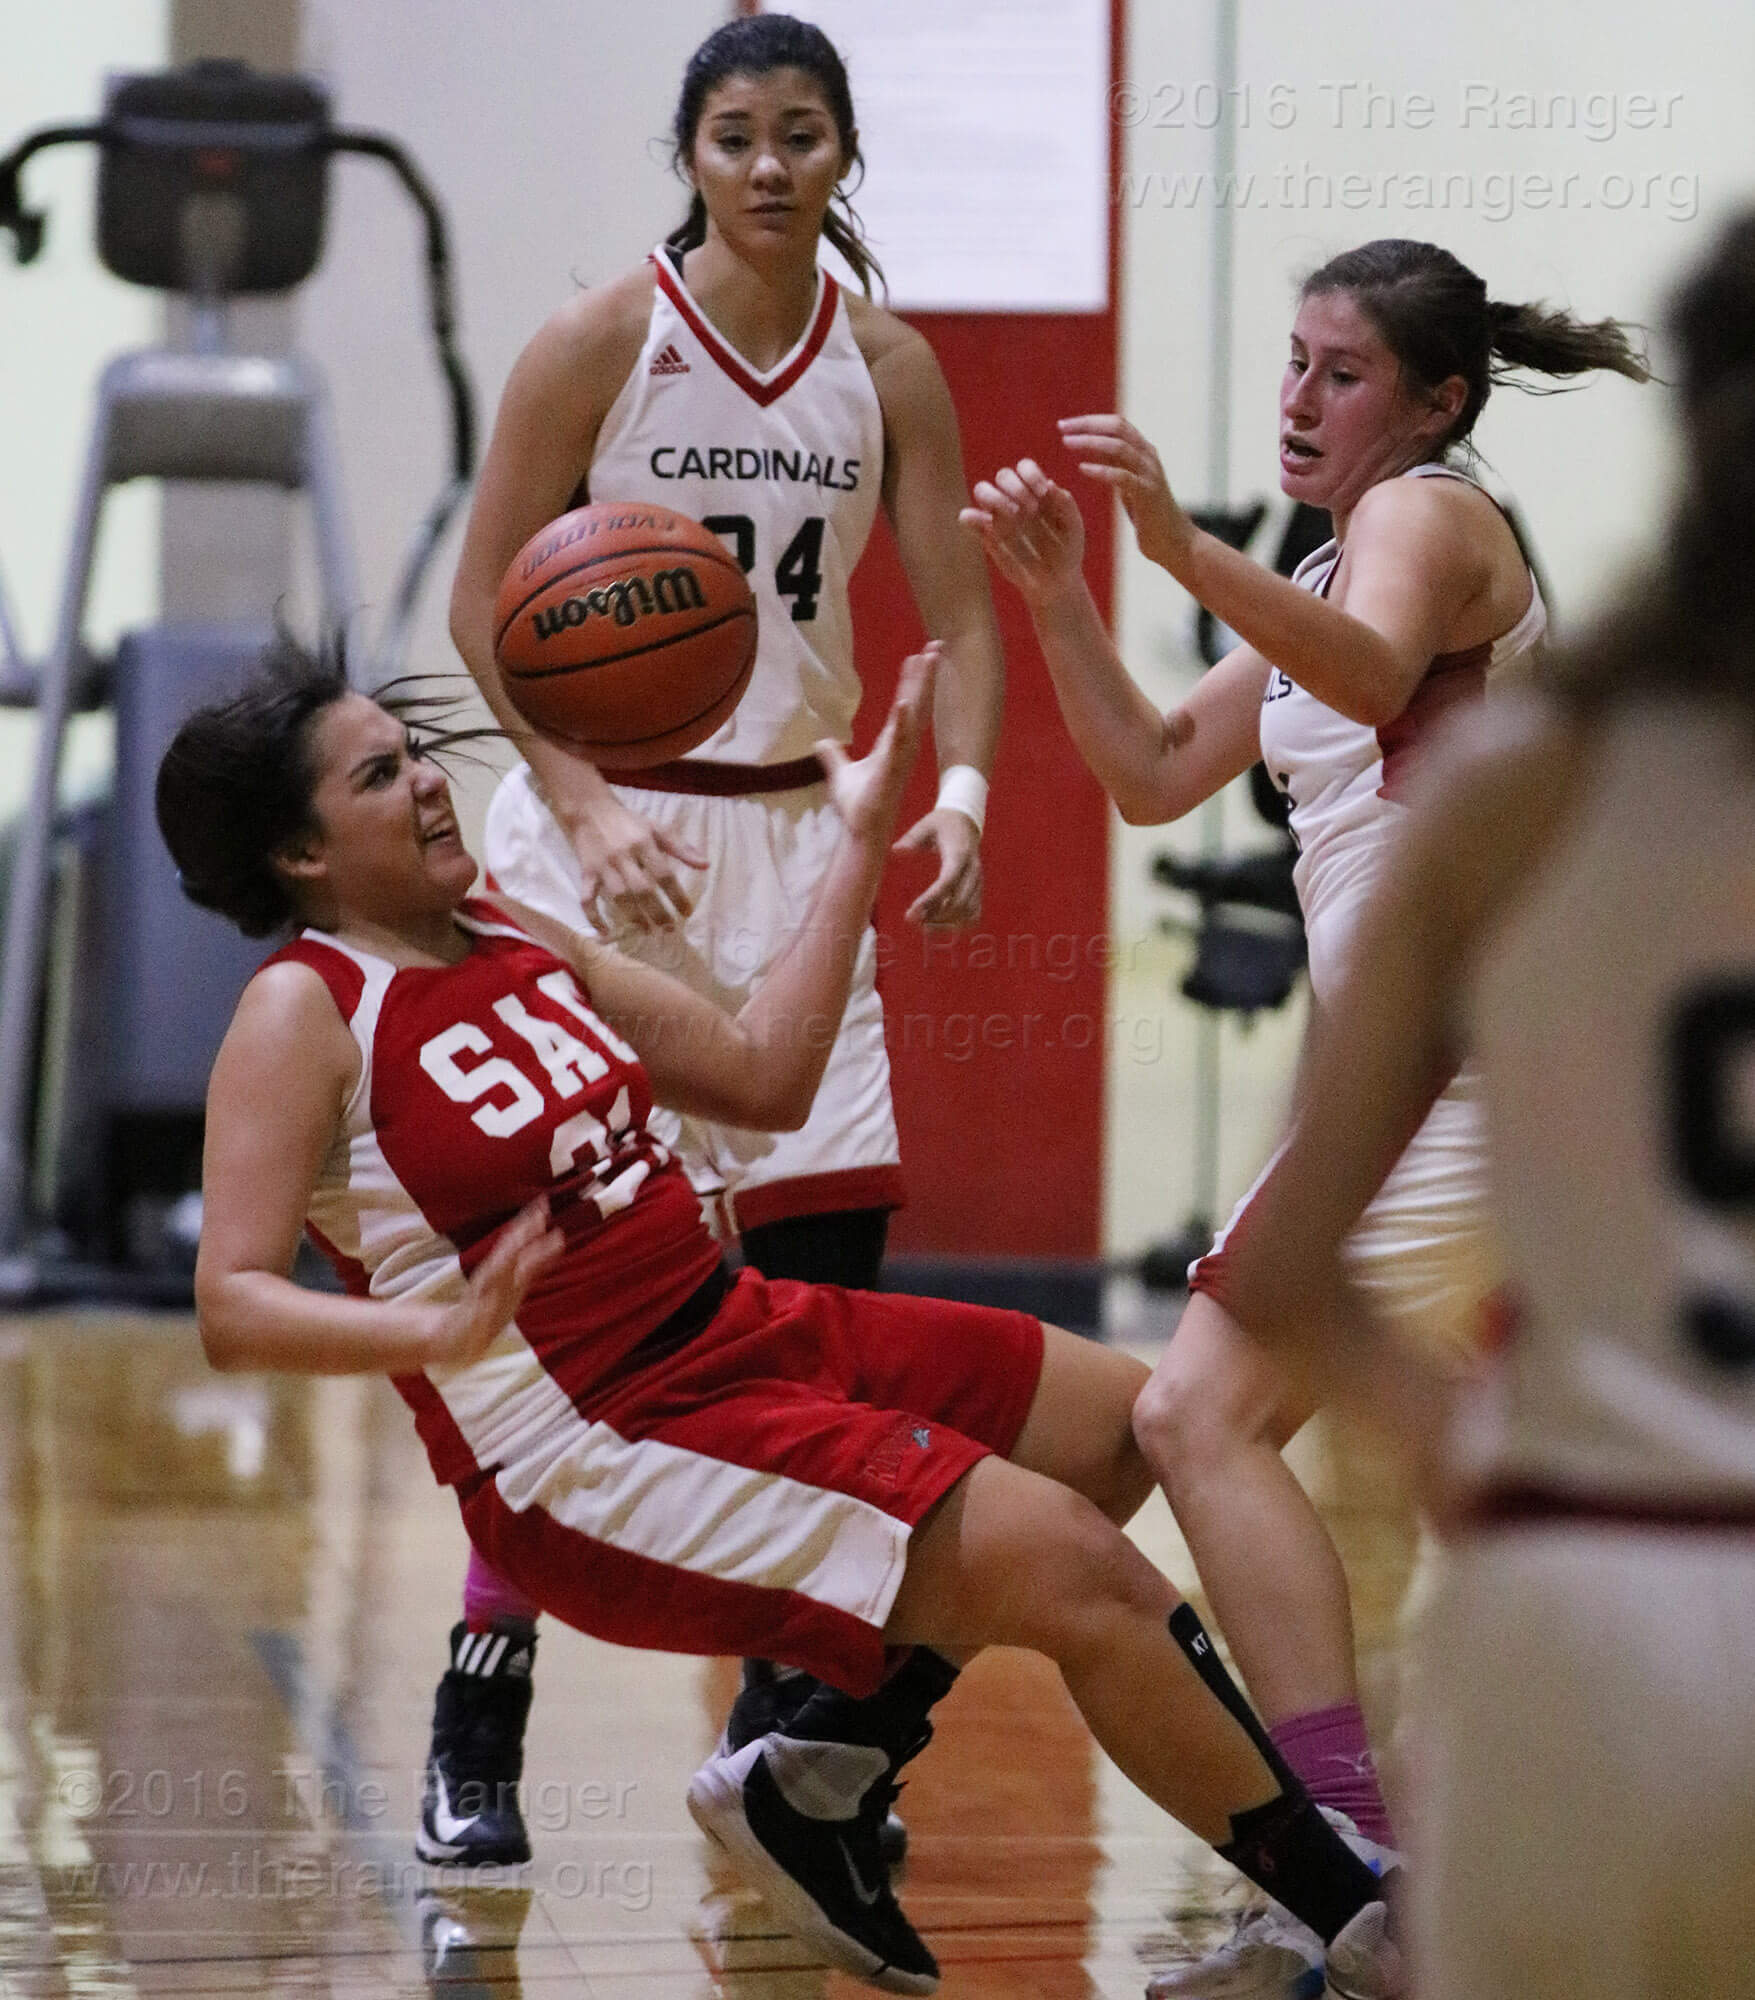 31ce73c8 Women's basketball team falls 52-43 to Cardinals in season opener